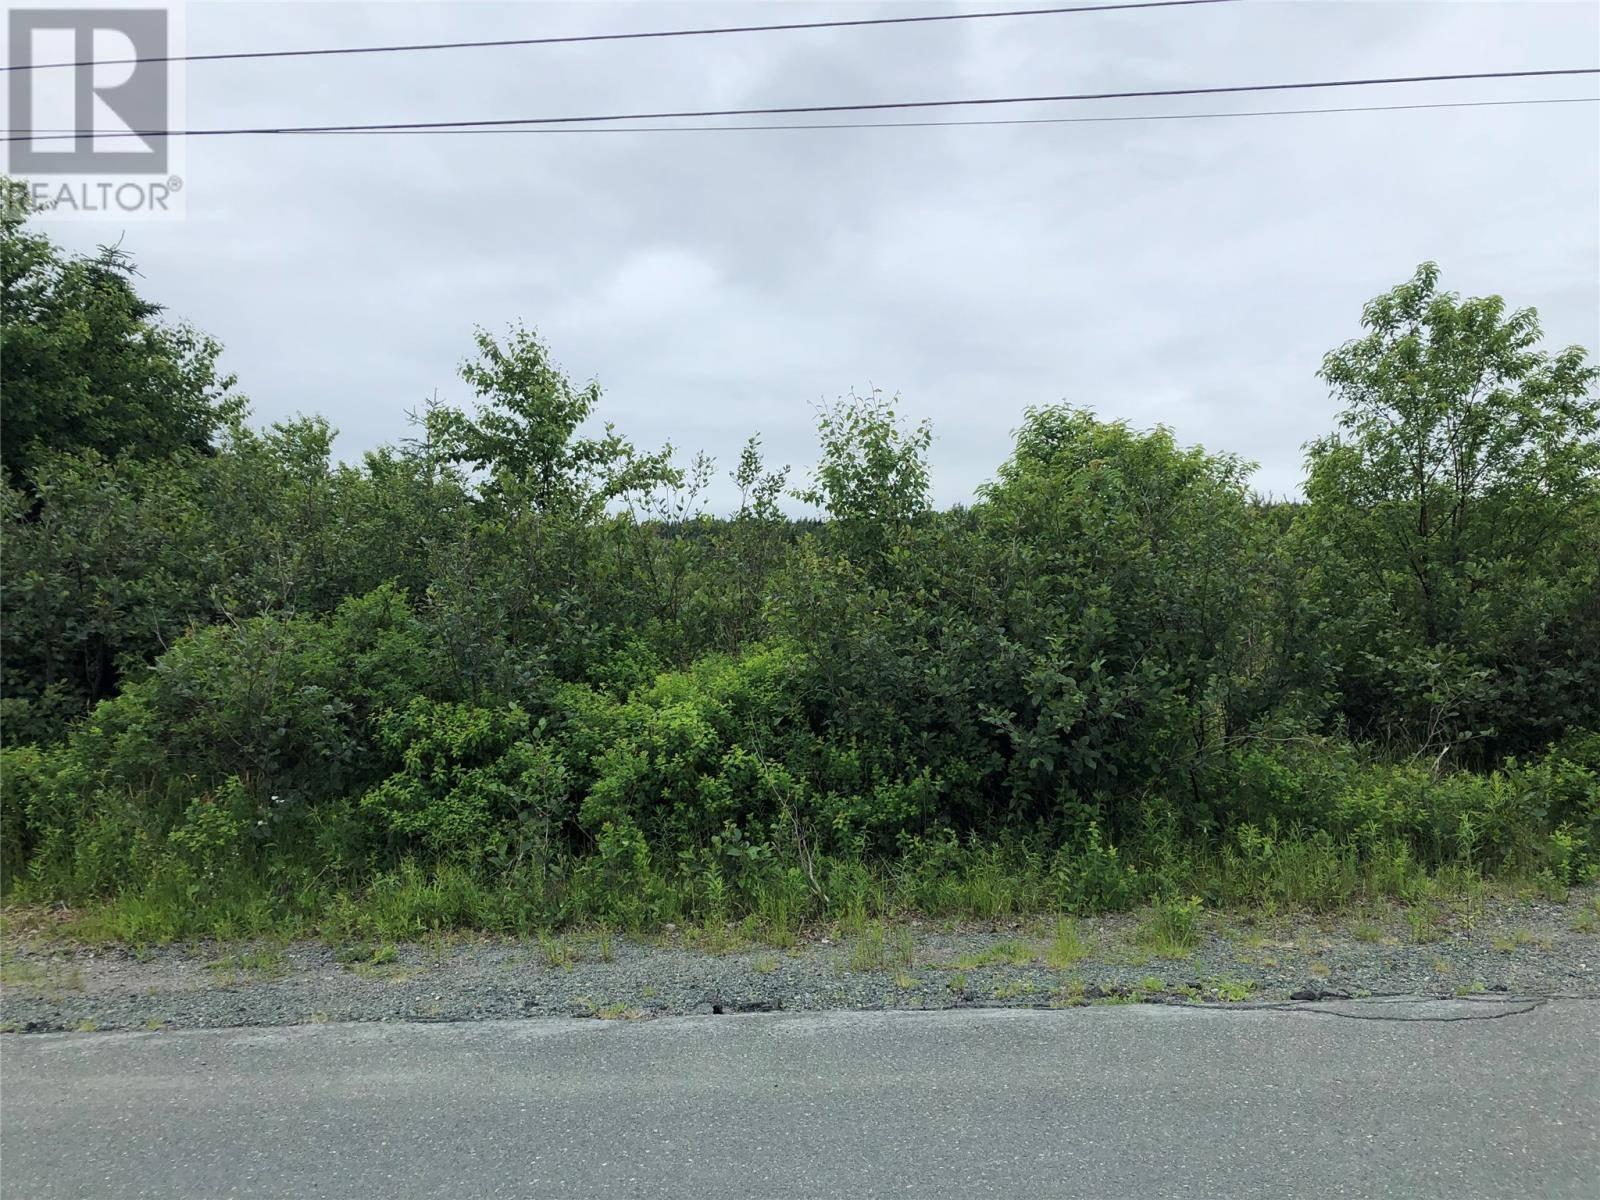 Home for sale at 30 Angler Pl Cbs Newfoundland - MLS: 1199415